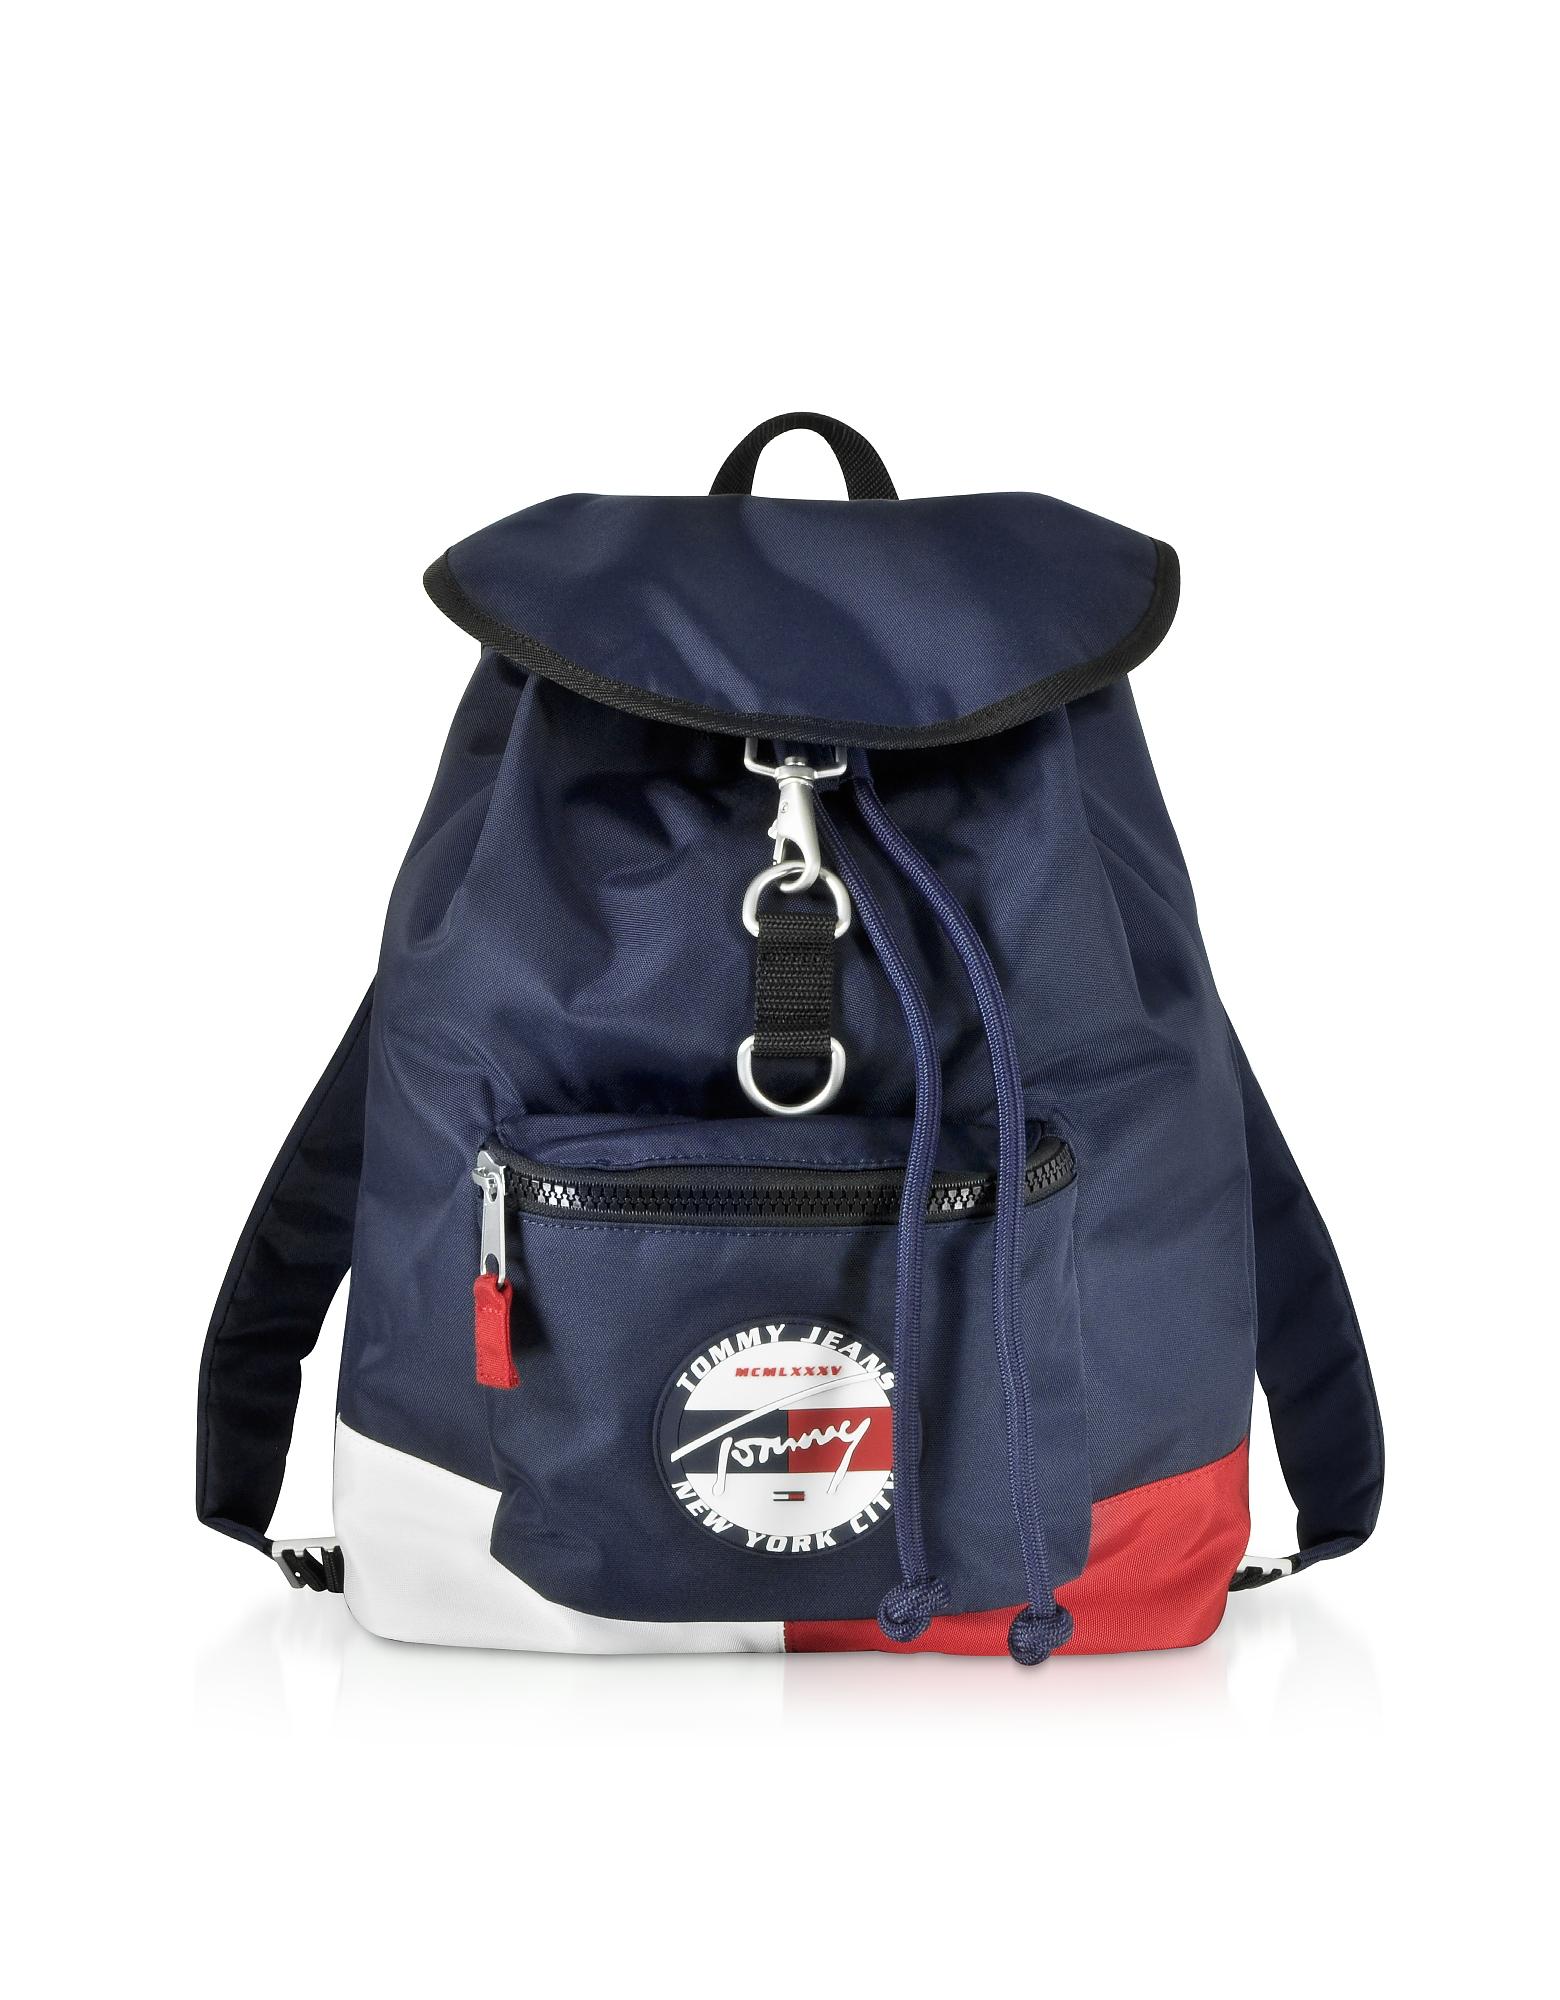 The Heritage Blue Nylon Backpack